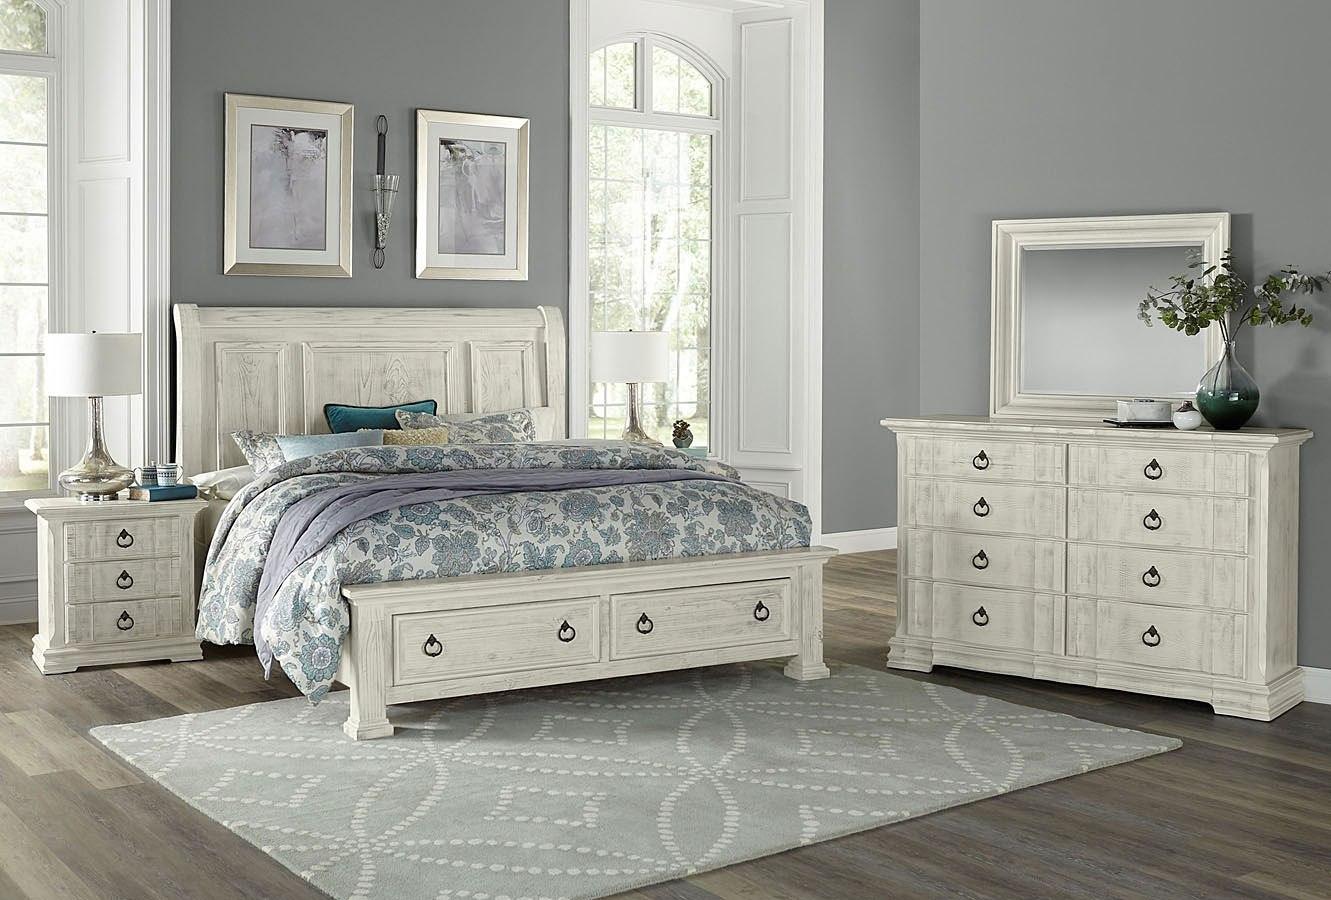 rustic hills sleigh storage bedroom set weathered white vaughan bassett furniture cart. Black Bedroom Furniture Sets. Home Design Ideas